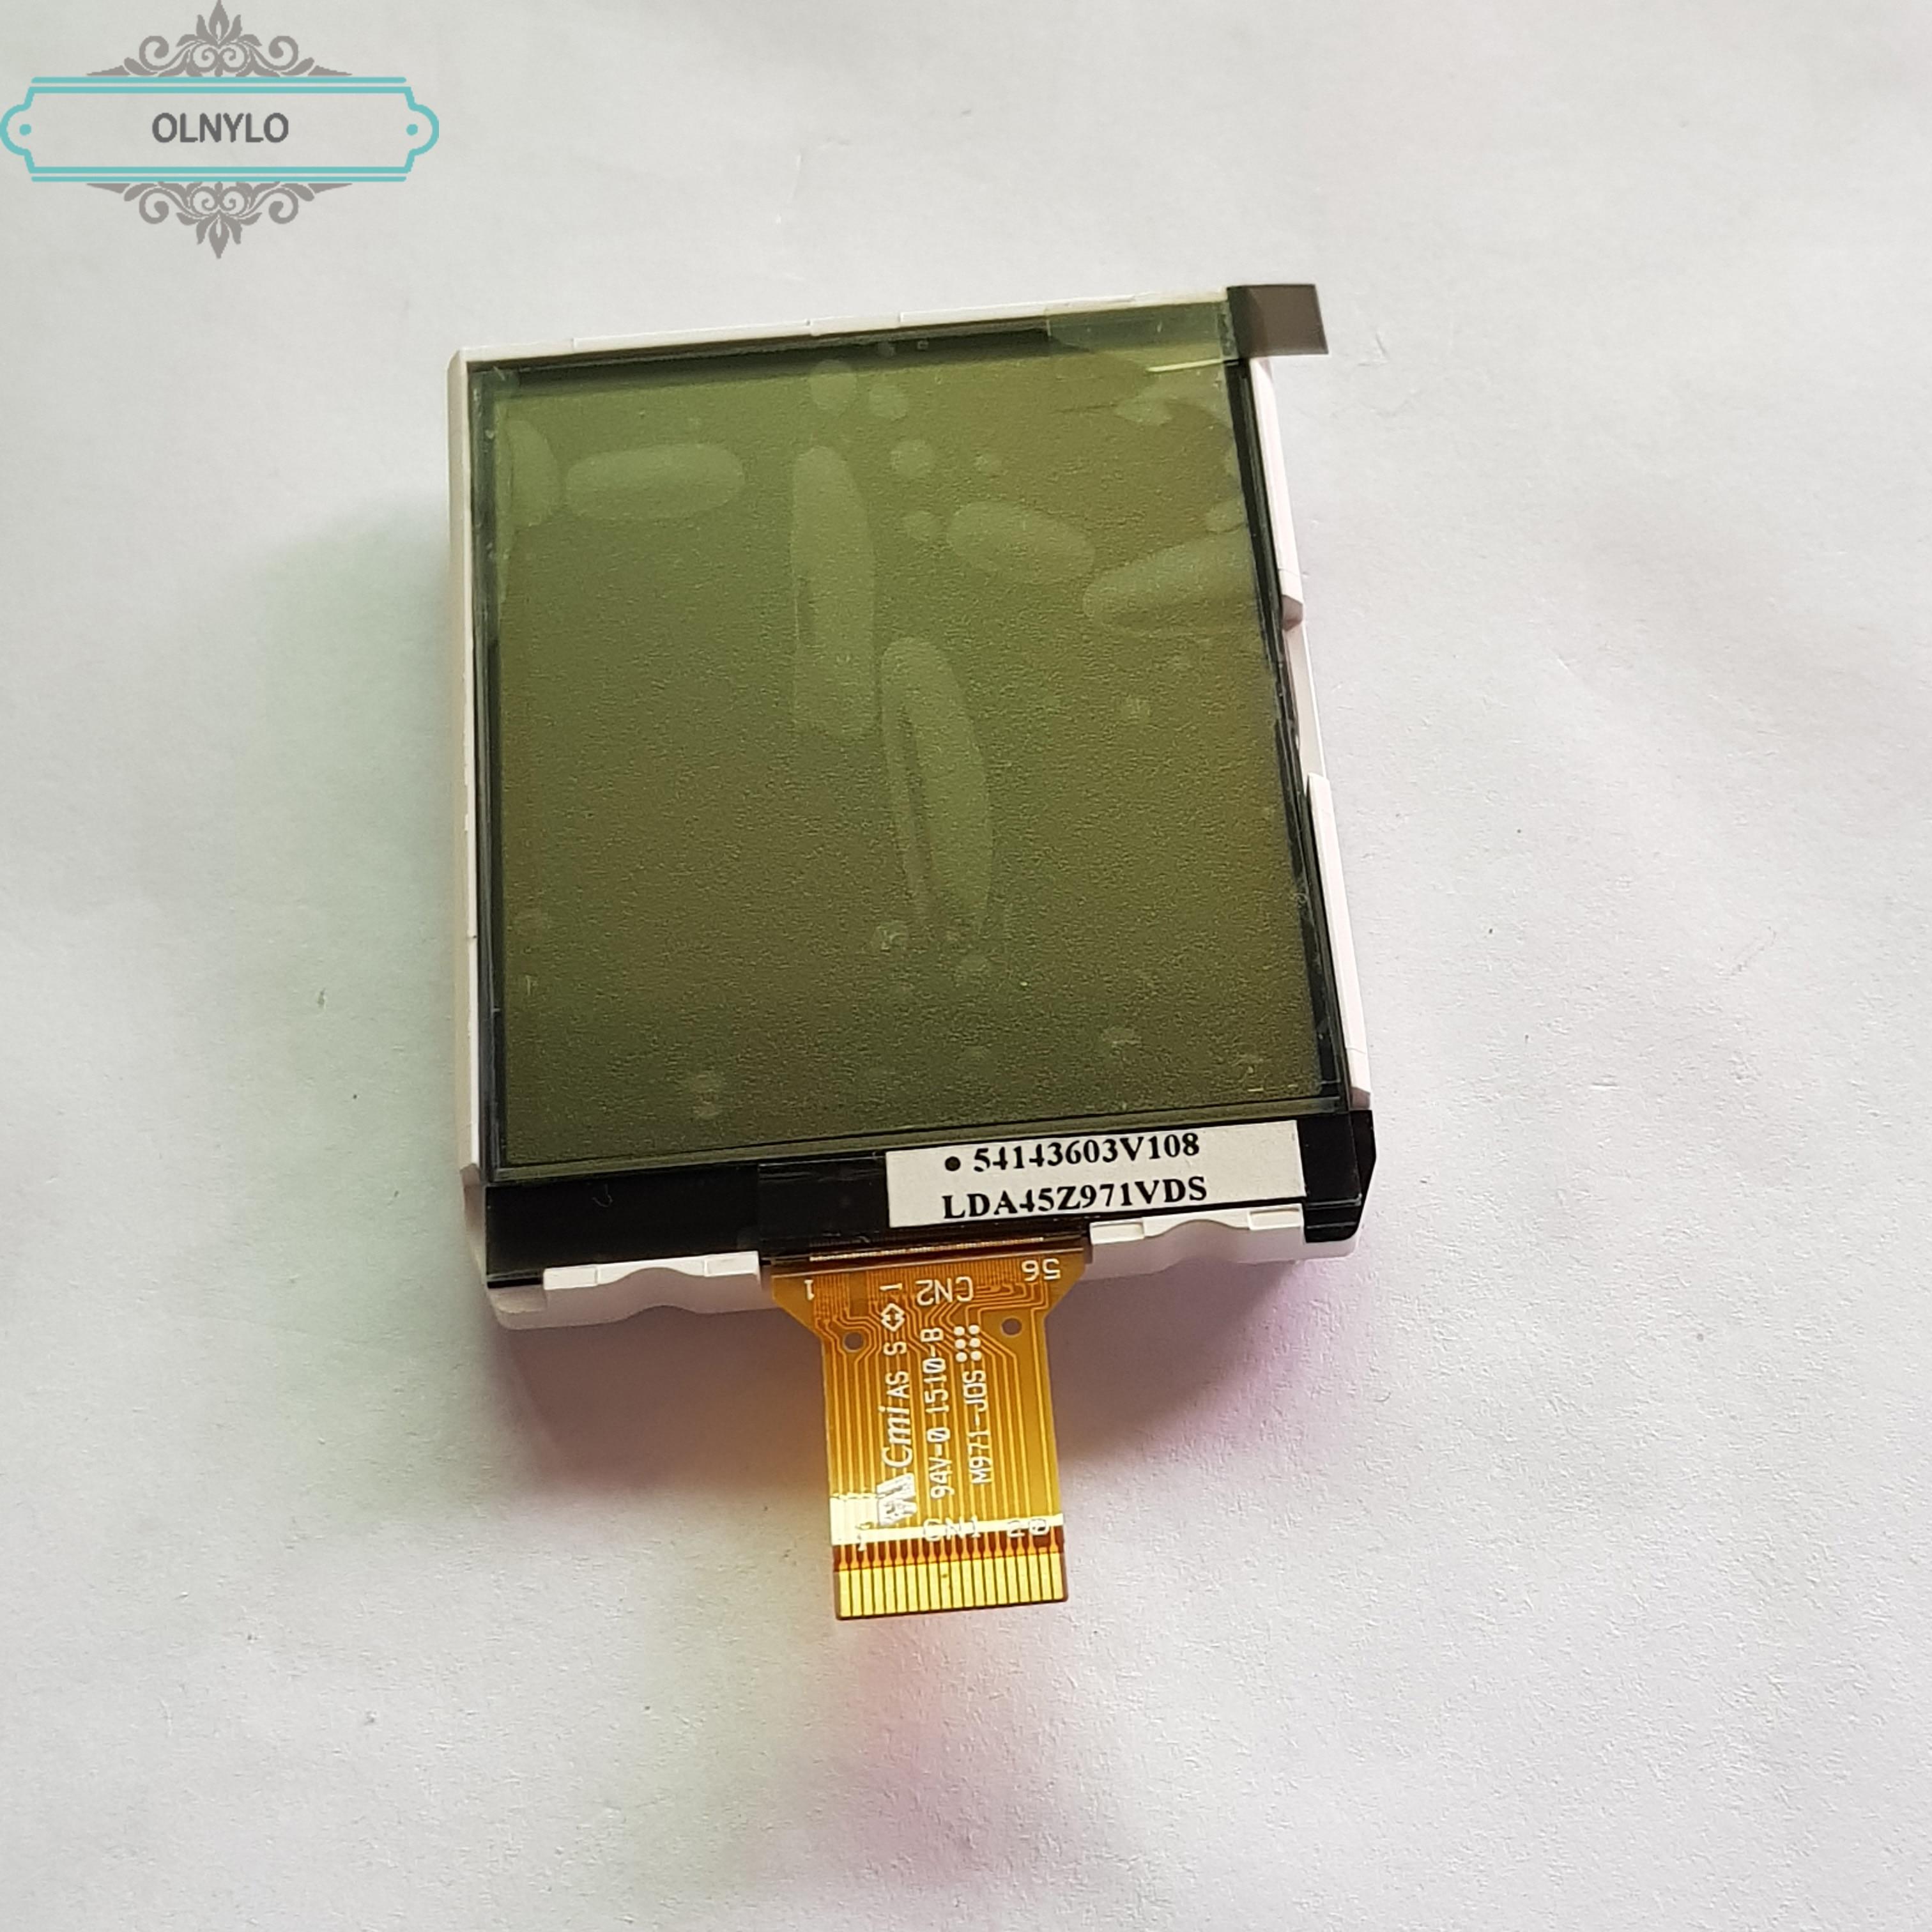 "2.4 ""polegadas lda45z971vds 94v-0 1512-b M971-JOS tela lcd para garmin etrex 10 handheld gps lcd painel de tela"